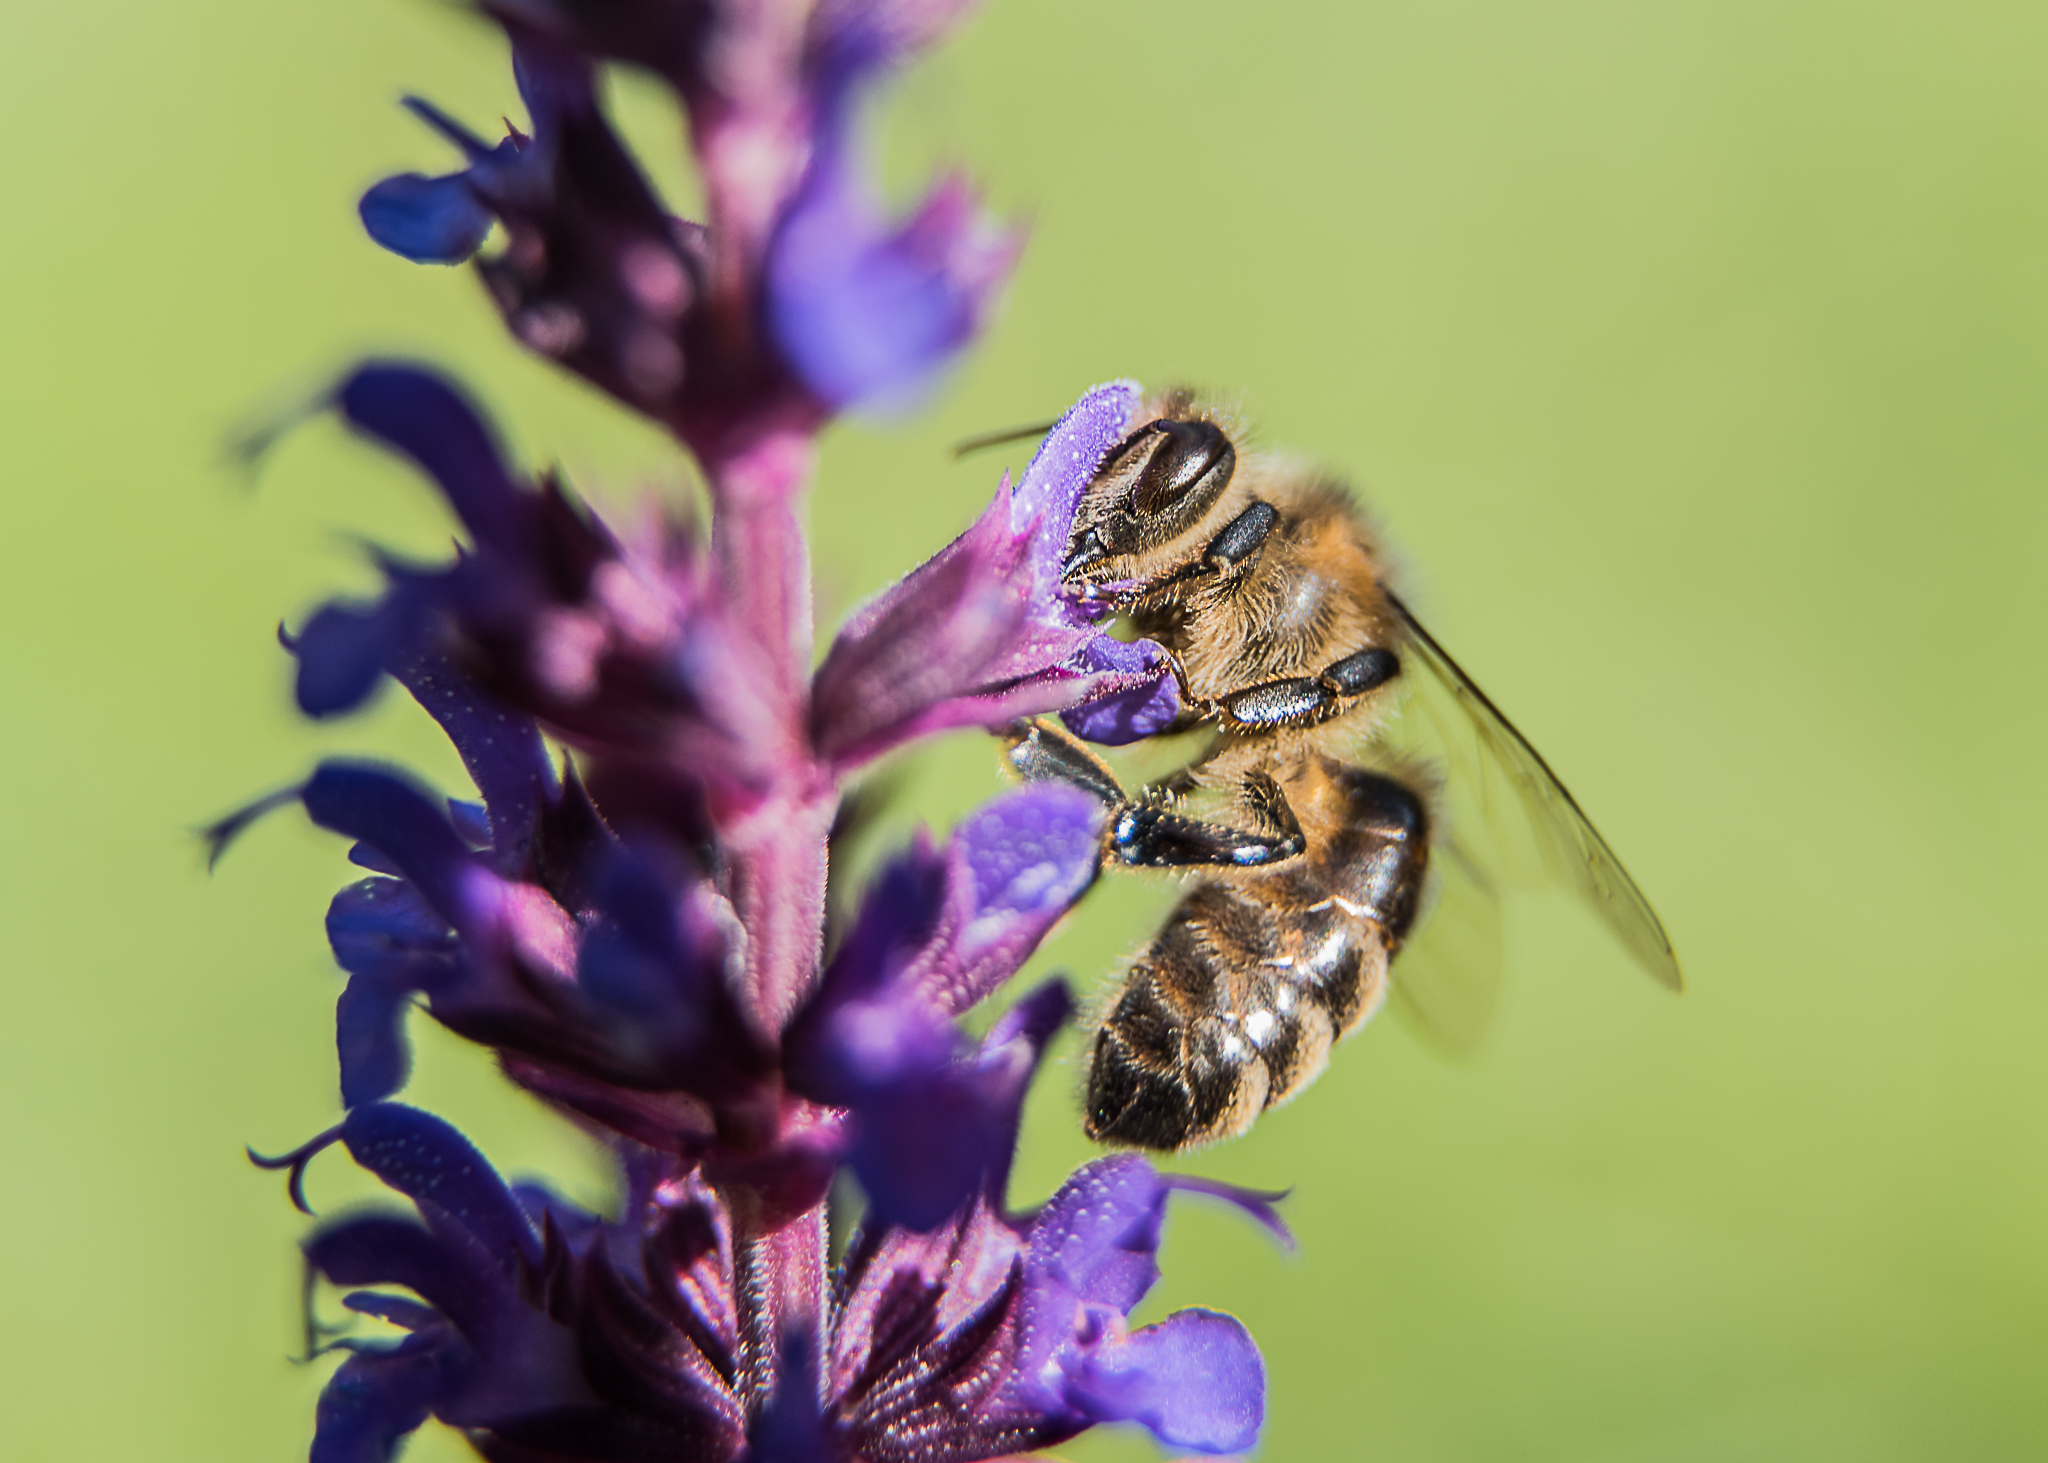 Pszczoła makro